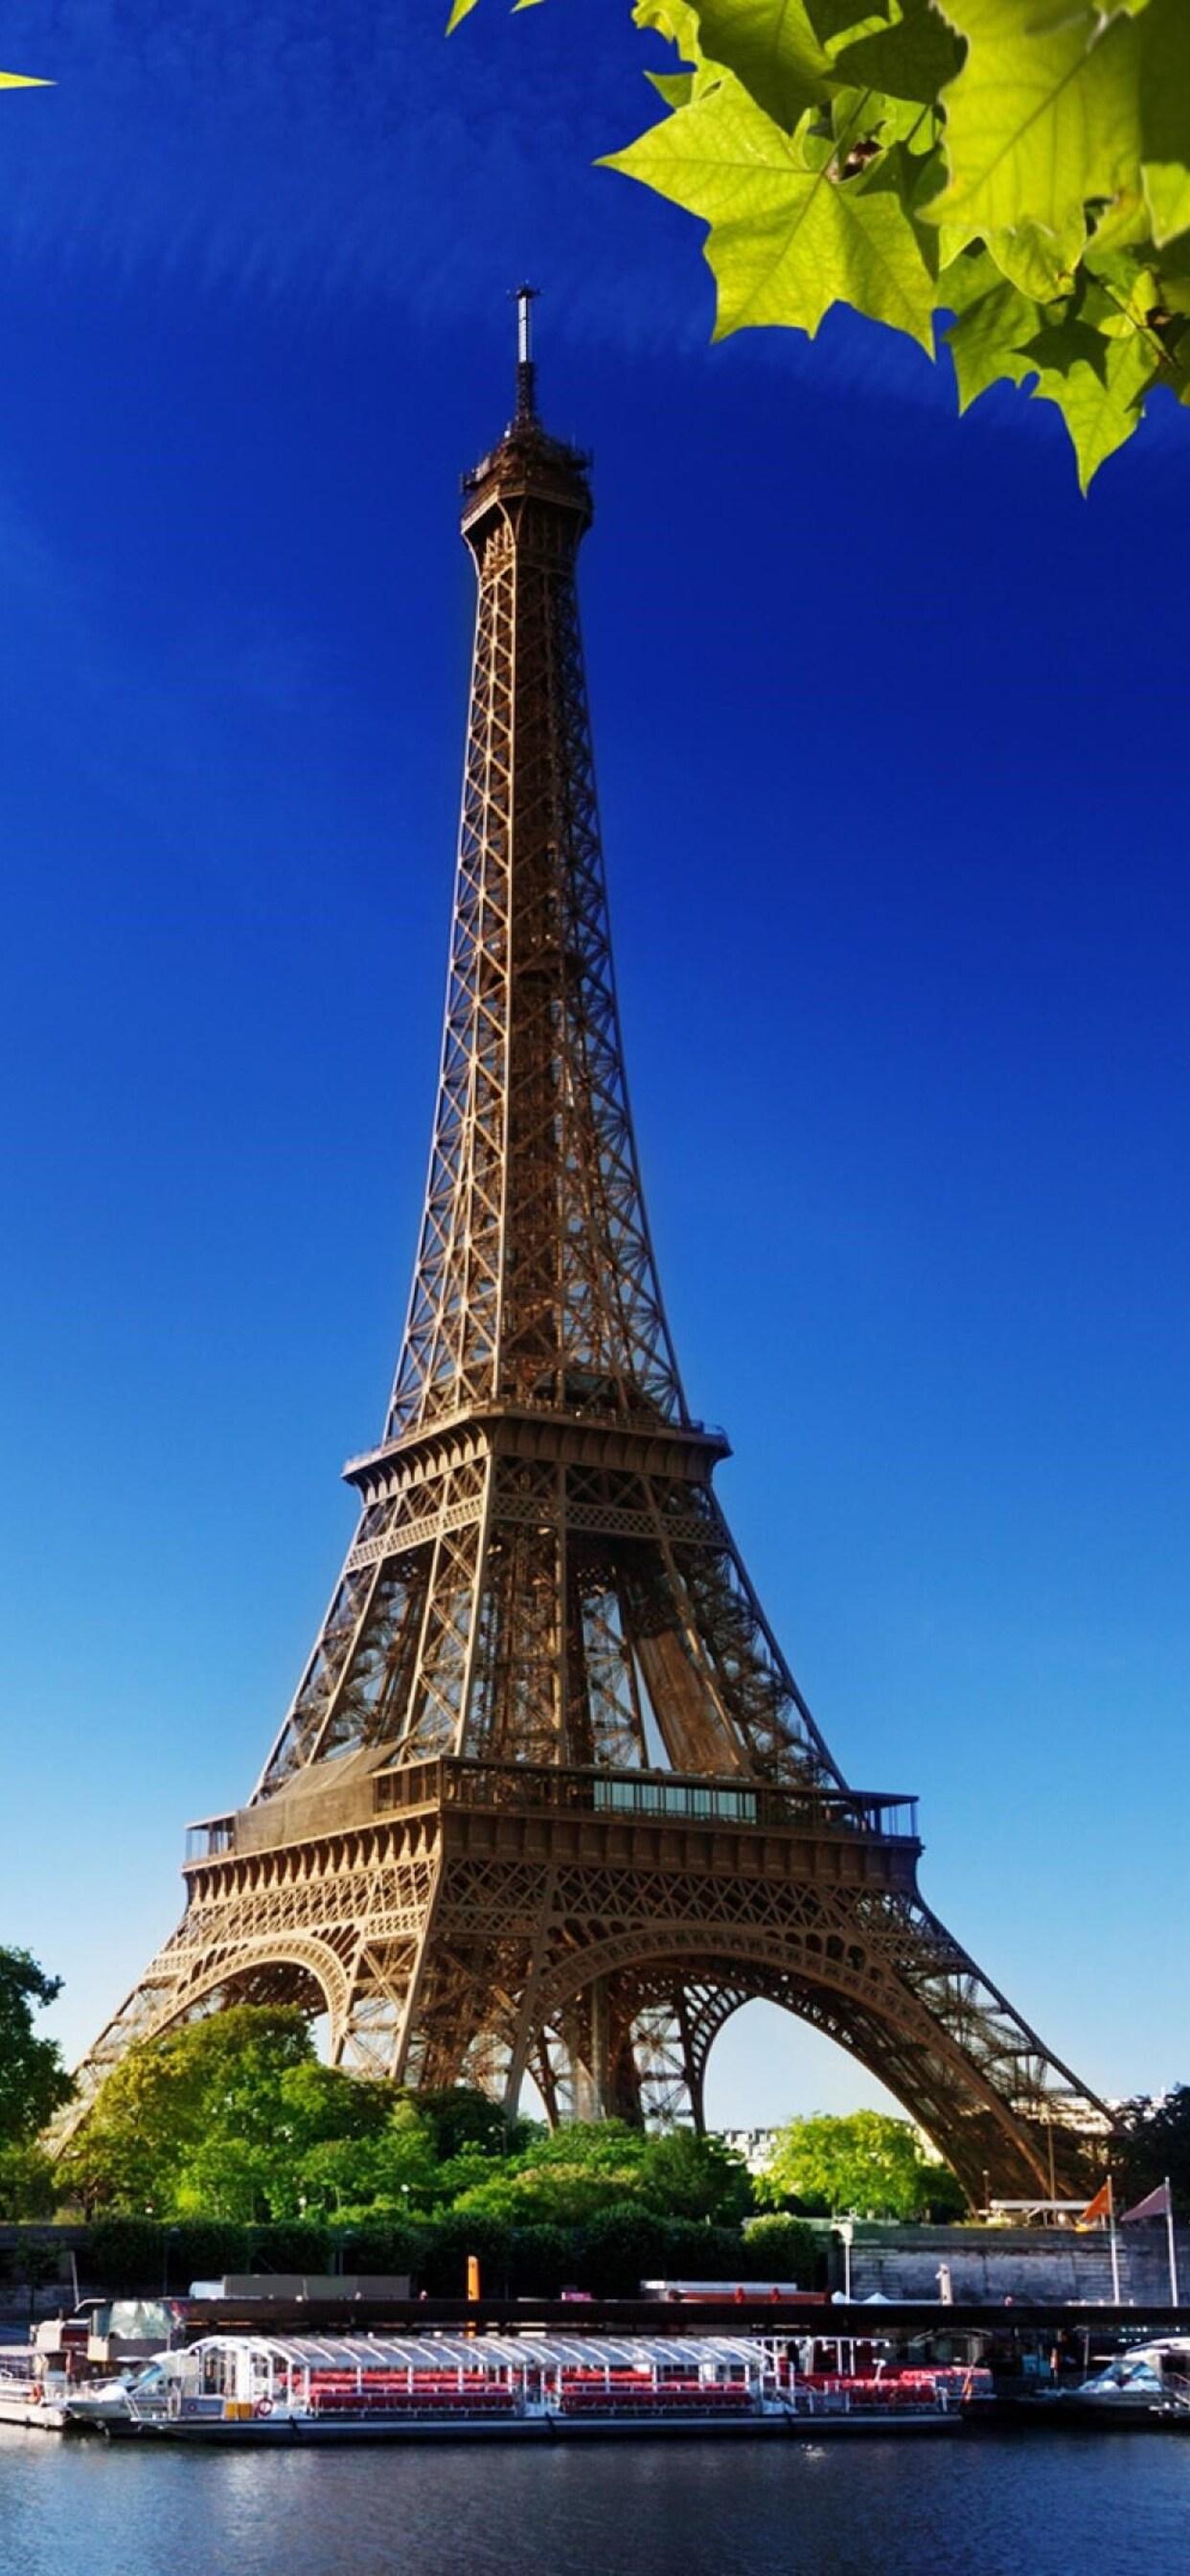 Cute Paris Computer Wallpaper 1242x2688 Eiffel Tower Paris 4k Iphone Xs Max Hd 4k